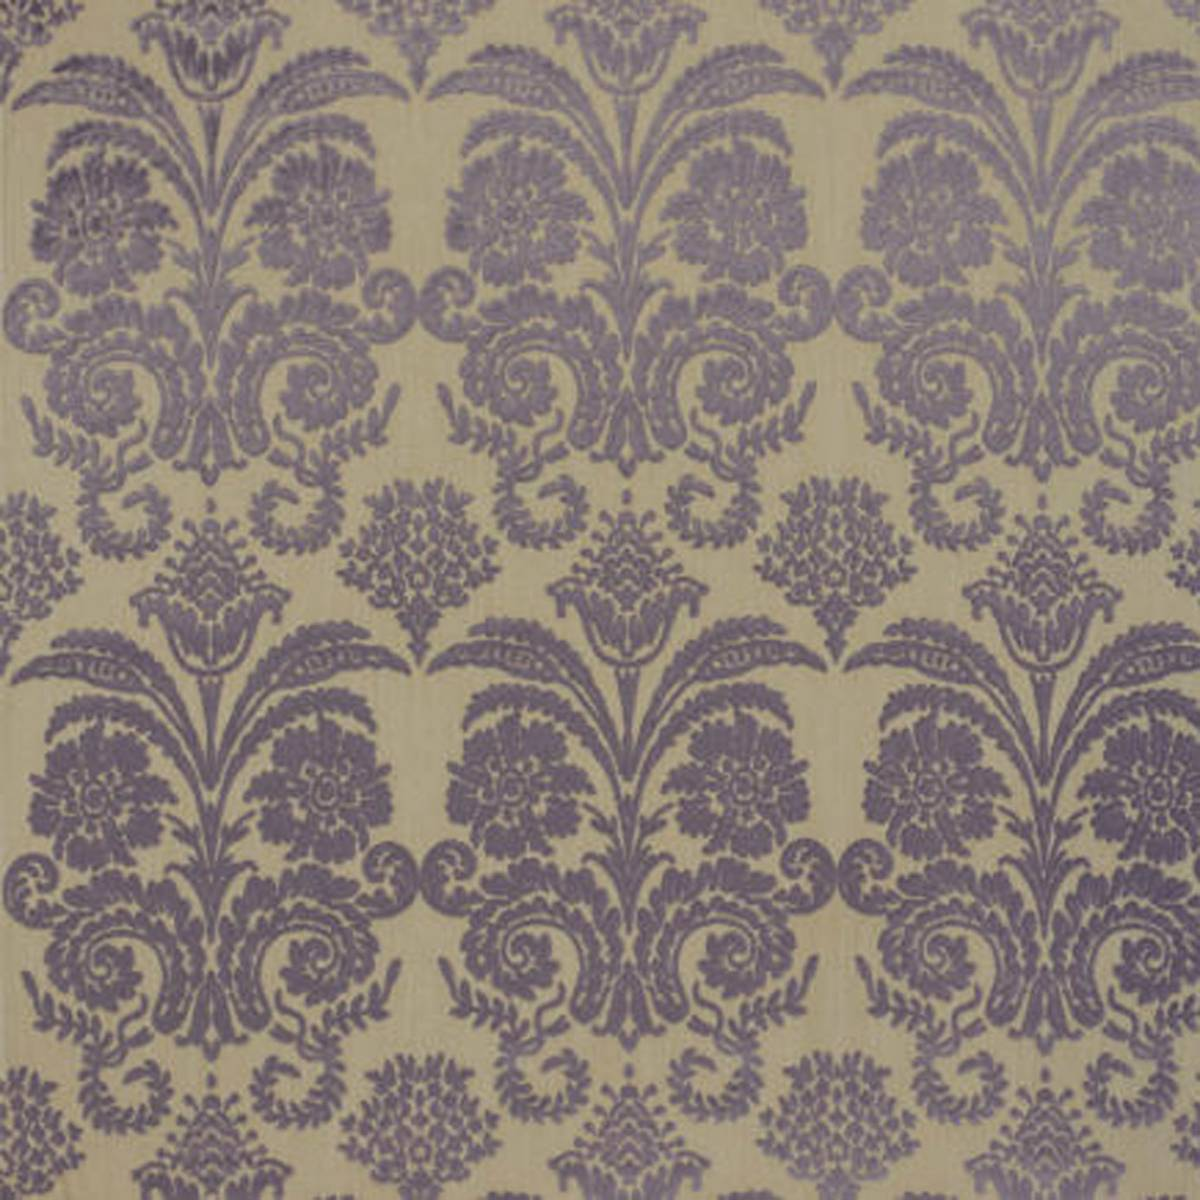 home fabrics designers guild trasimeno fabrics ombrione fabric slate